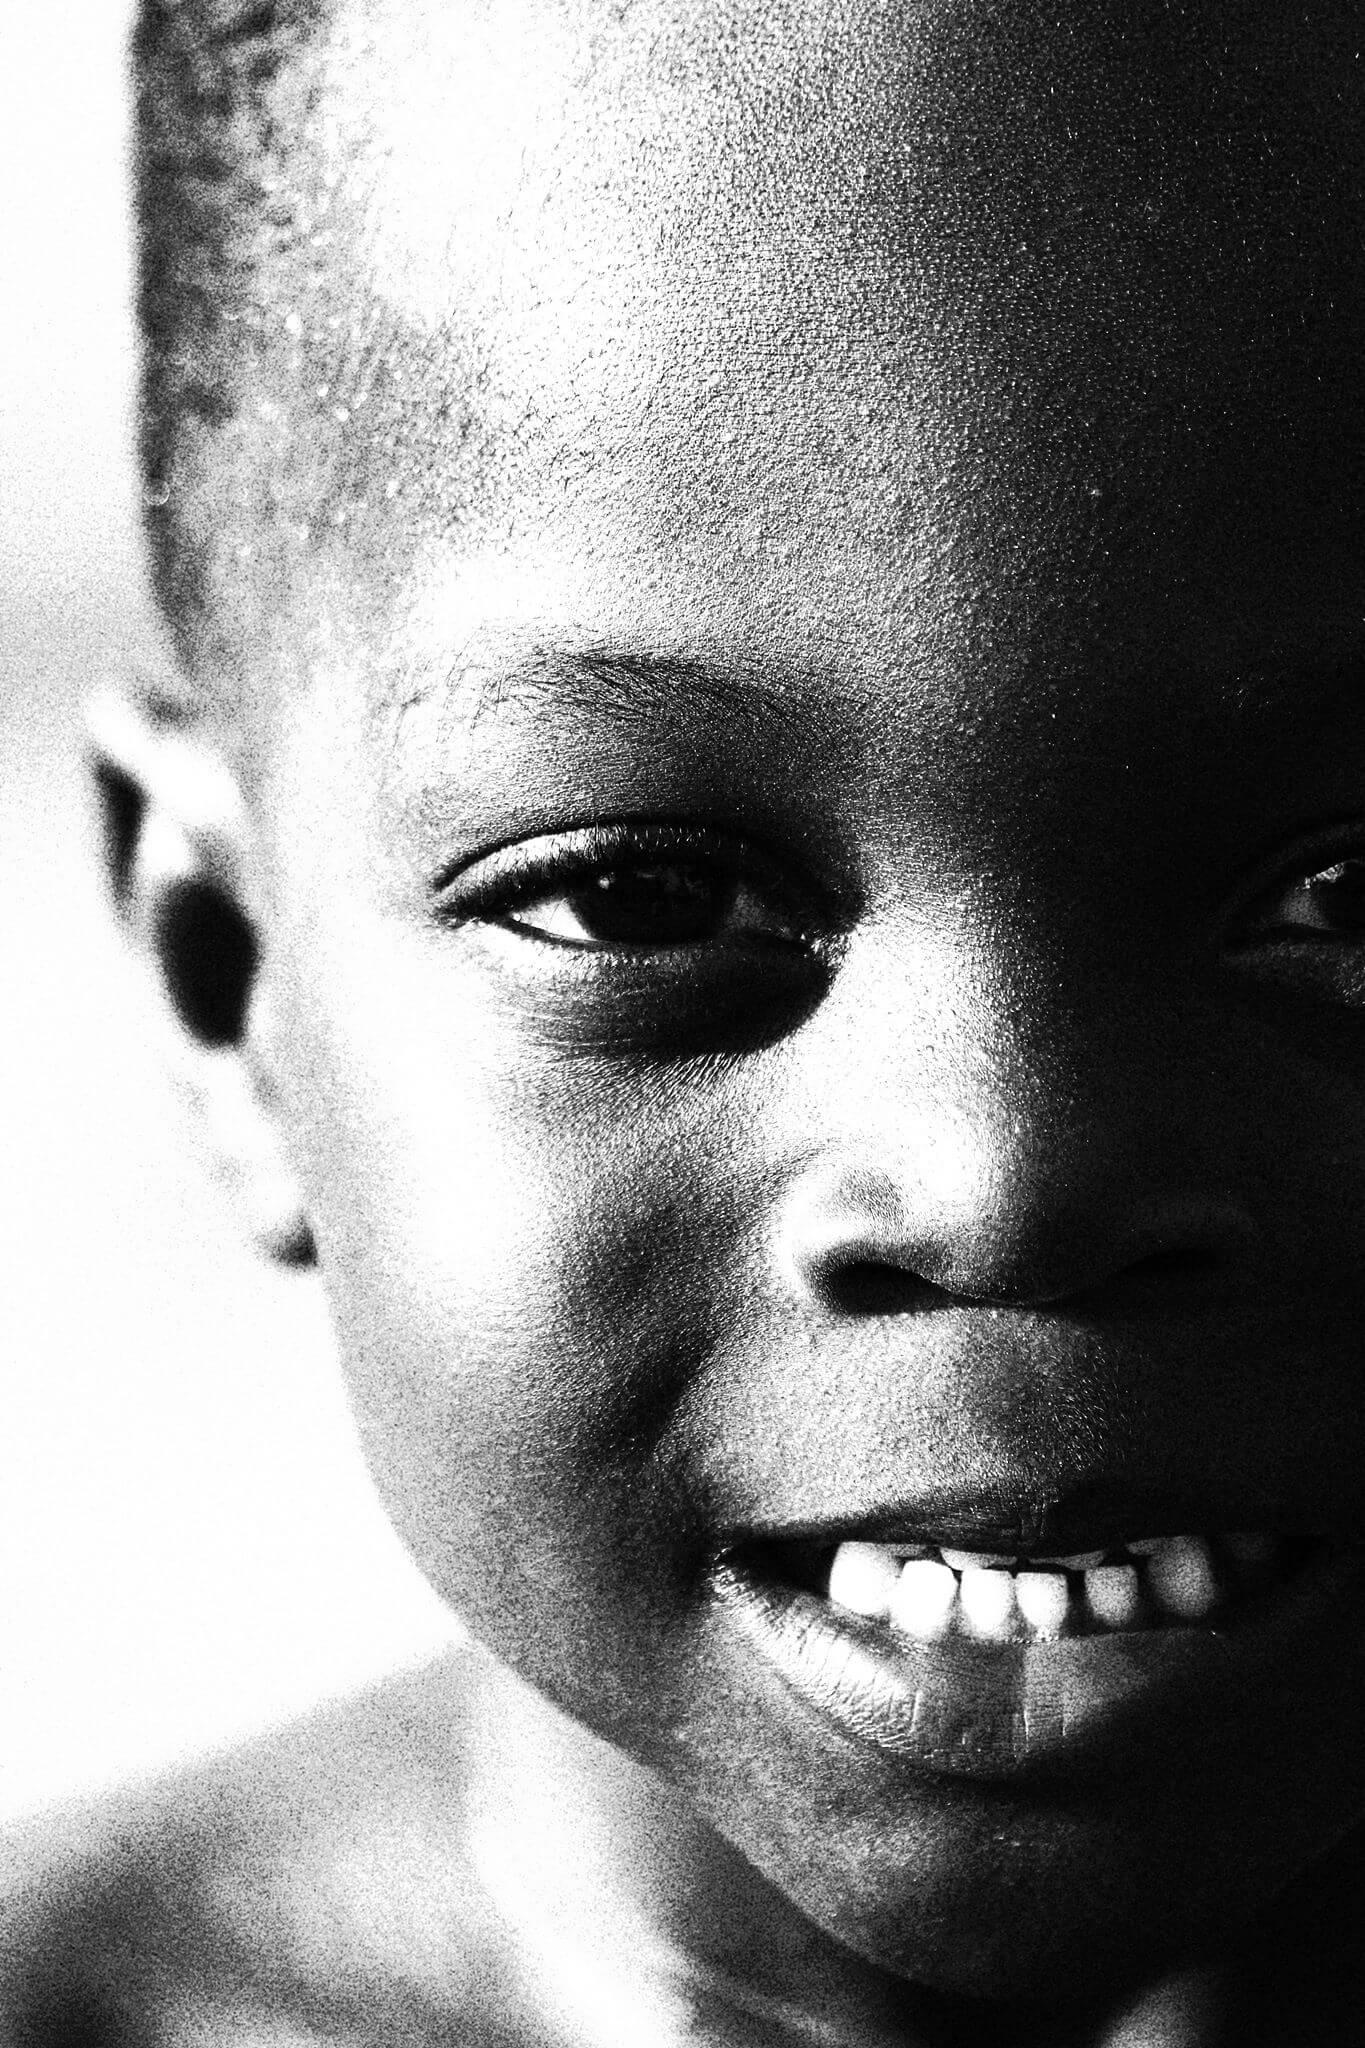 Mars 2017 : Exposition des photos «Un regard sur le Togo» de Jean-François Gaudin